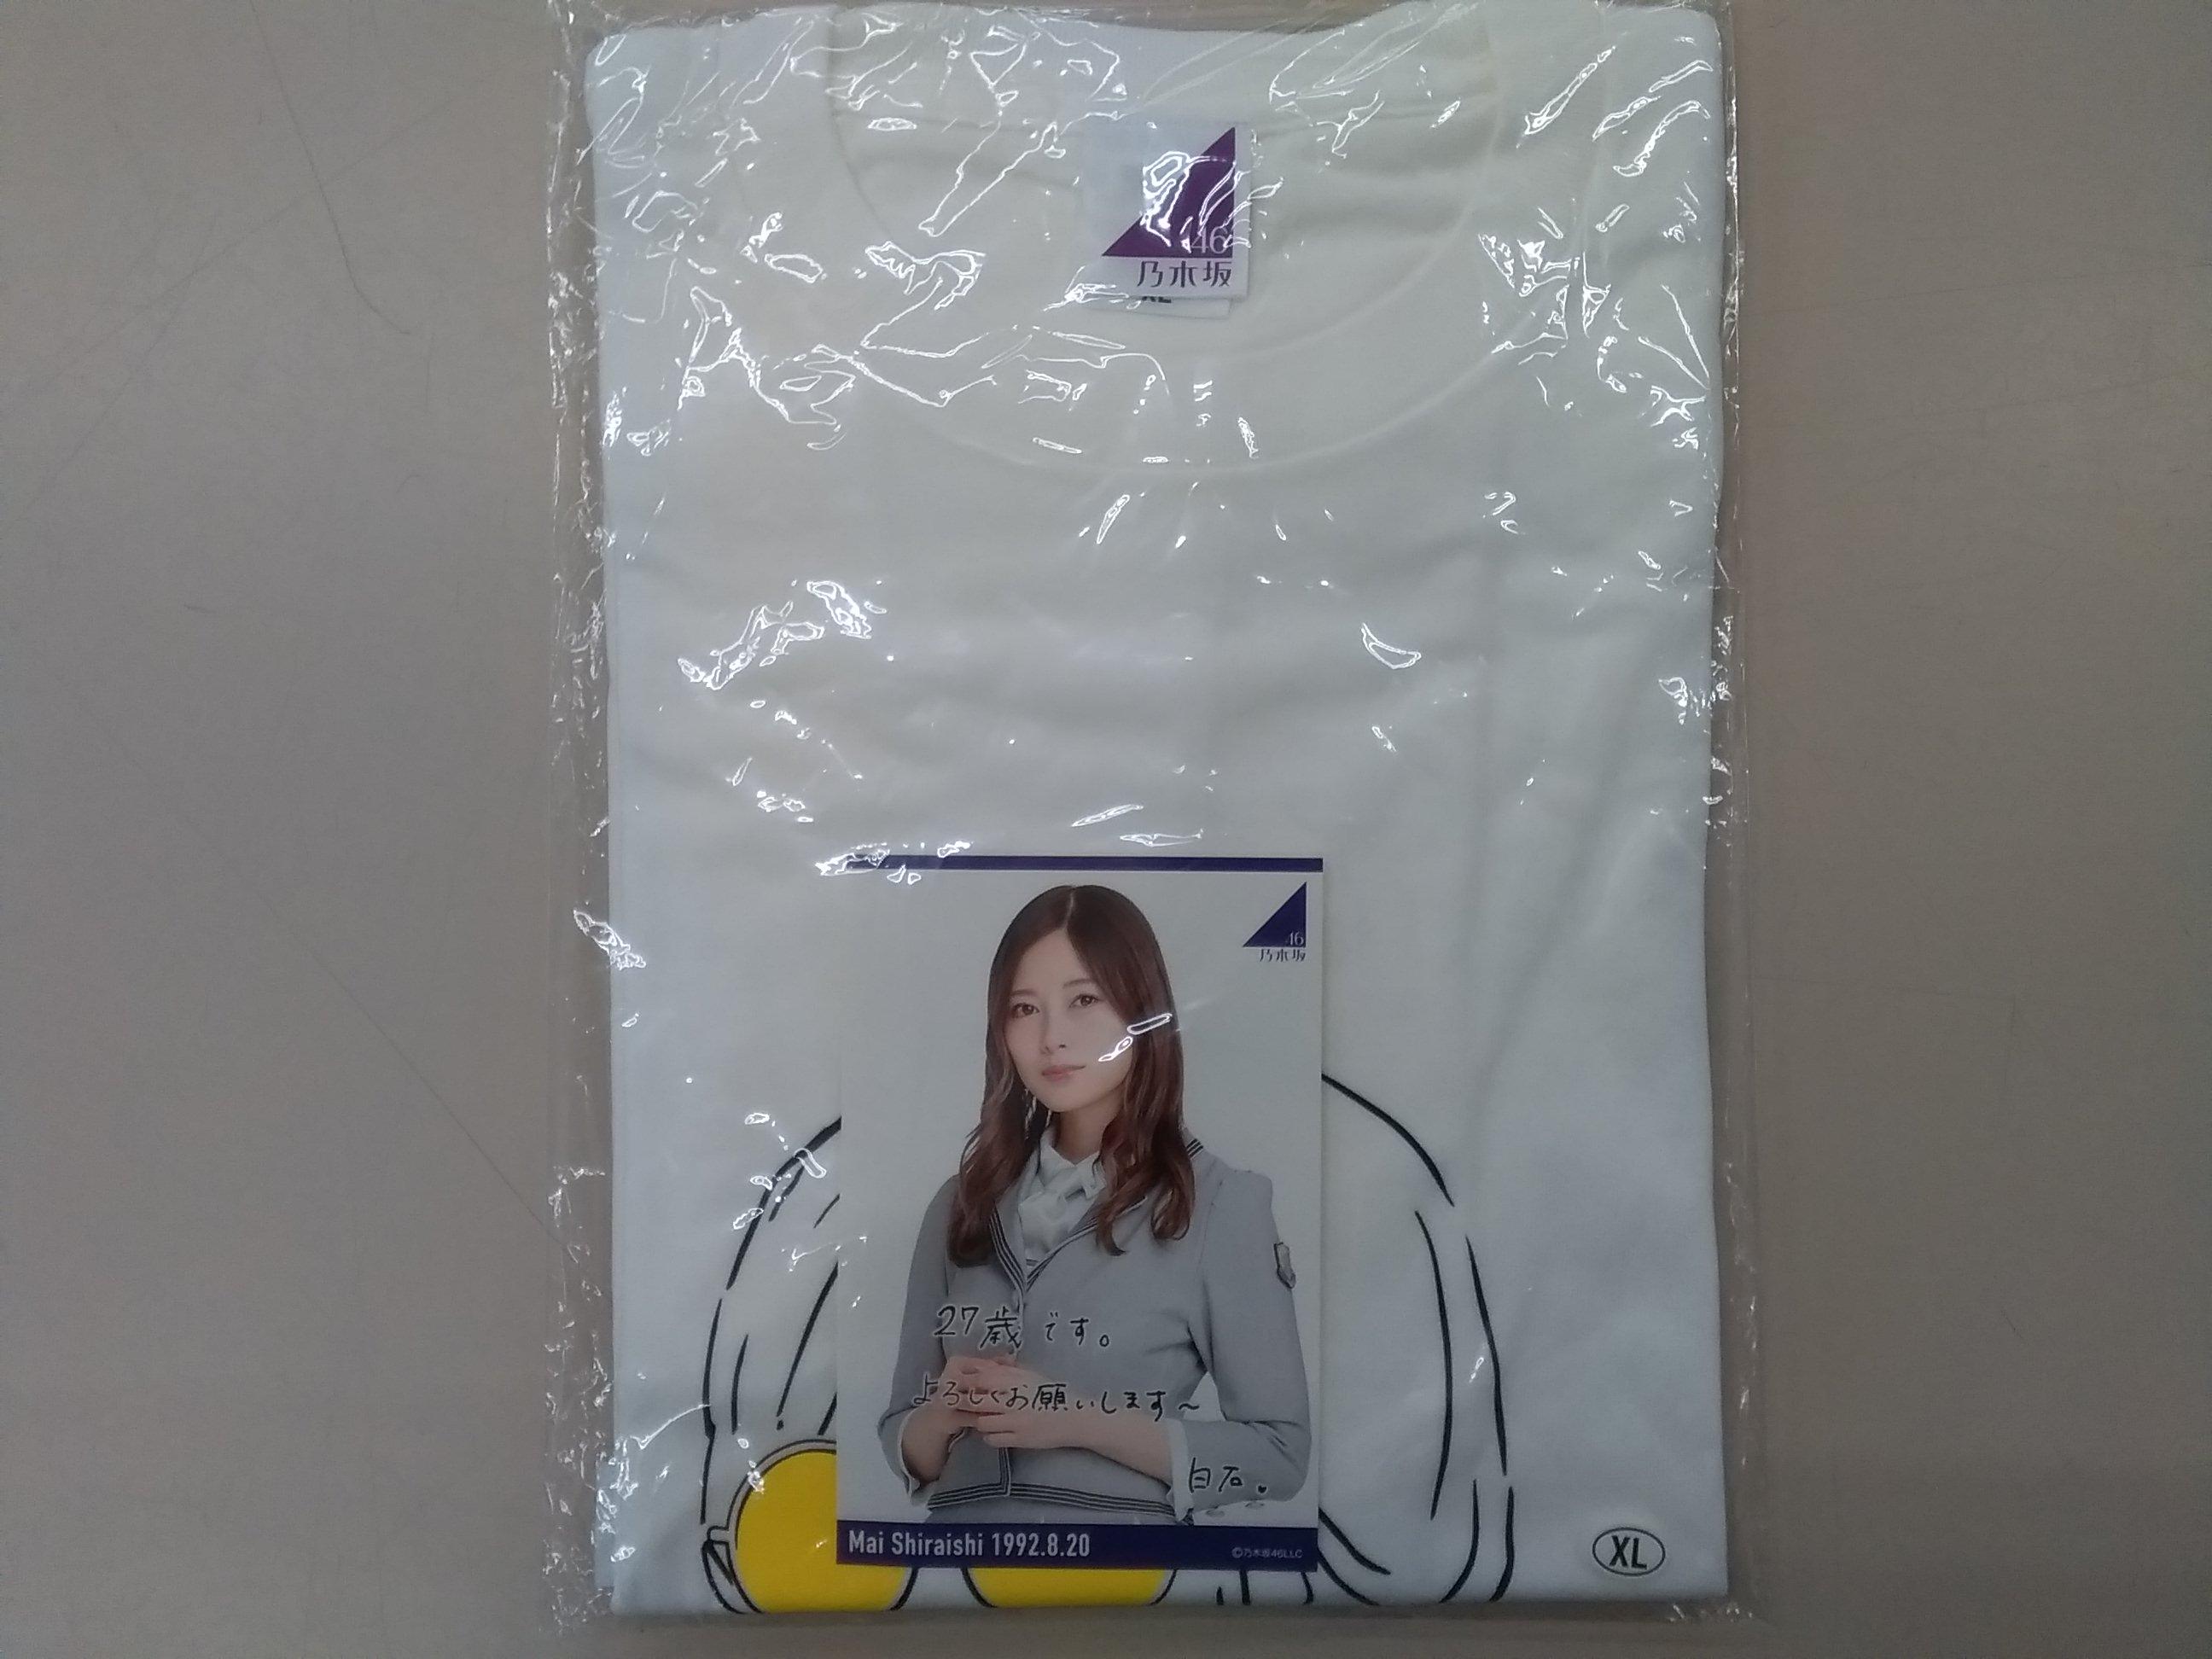 白石麻衣 2019年生誕記念Tシャツ|乃木坂46